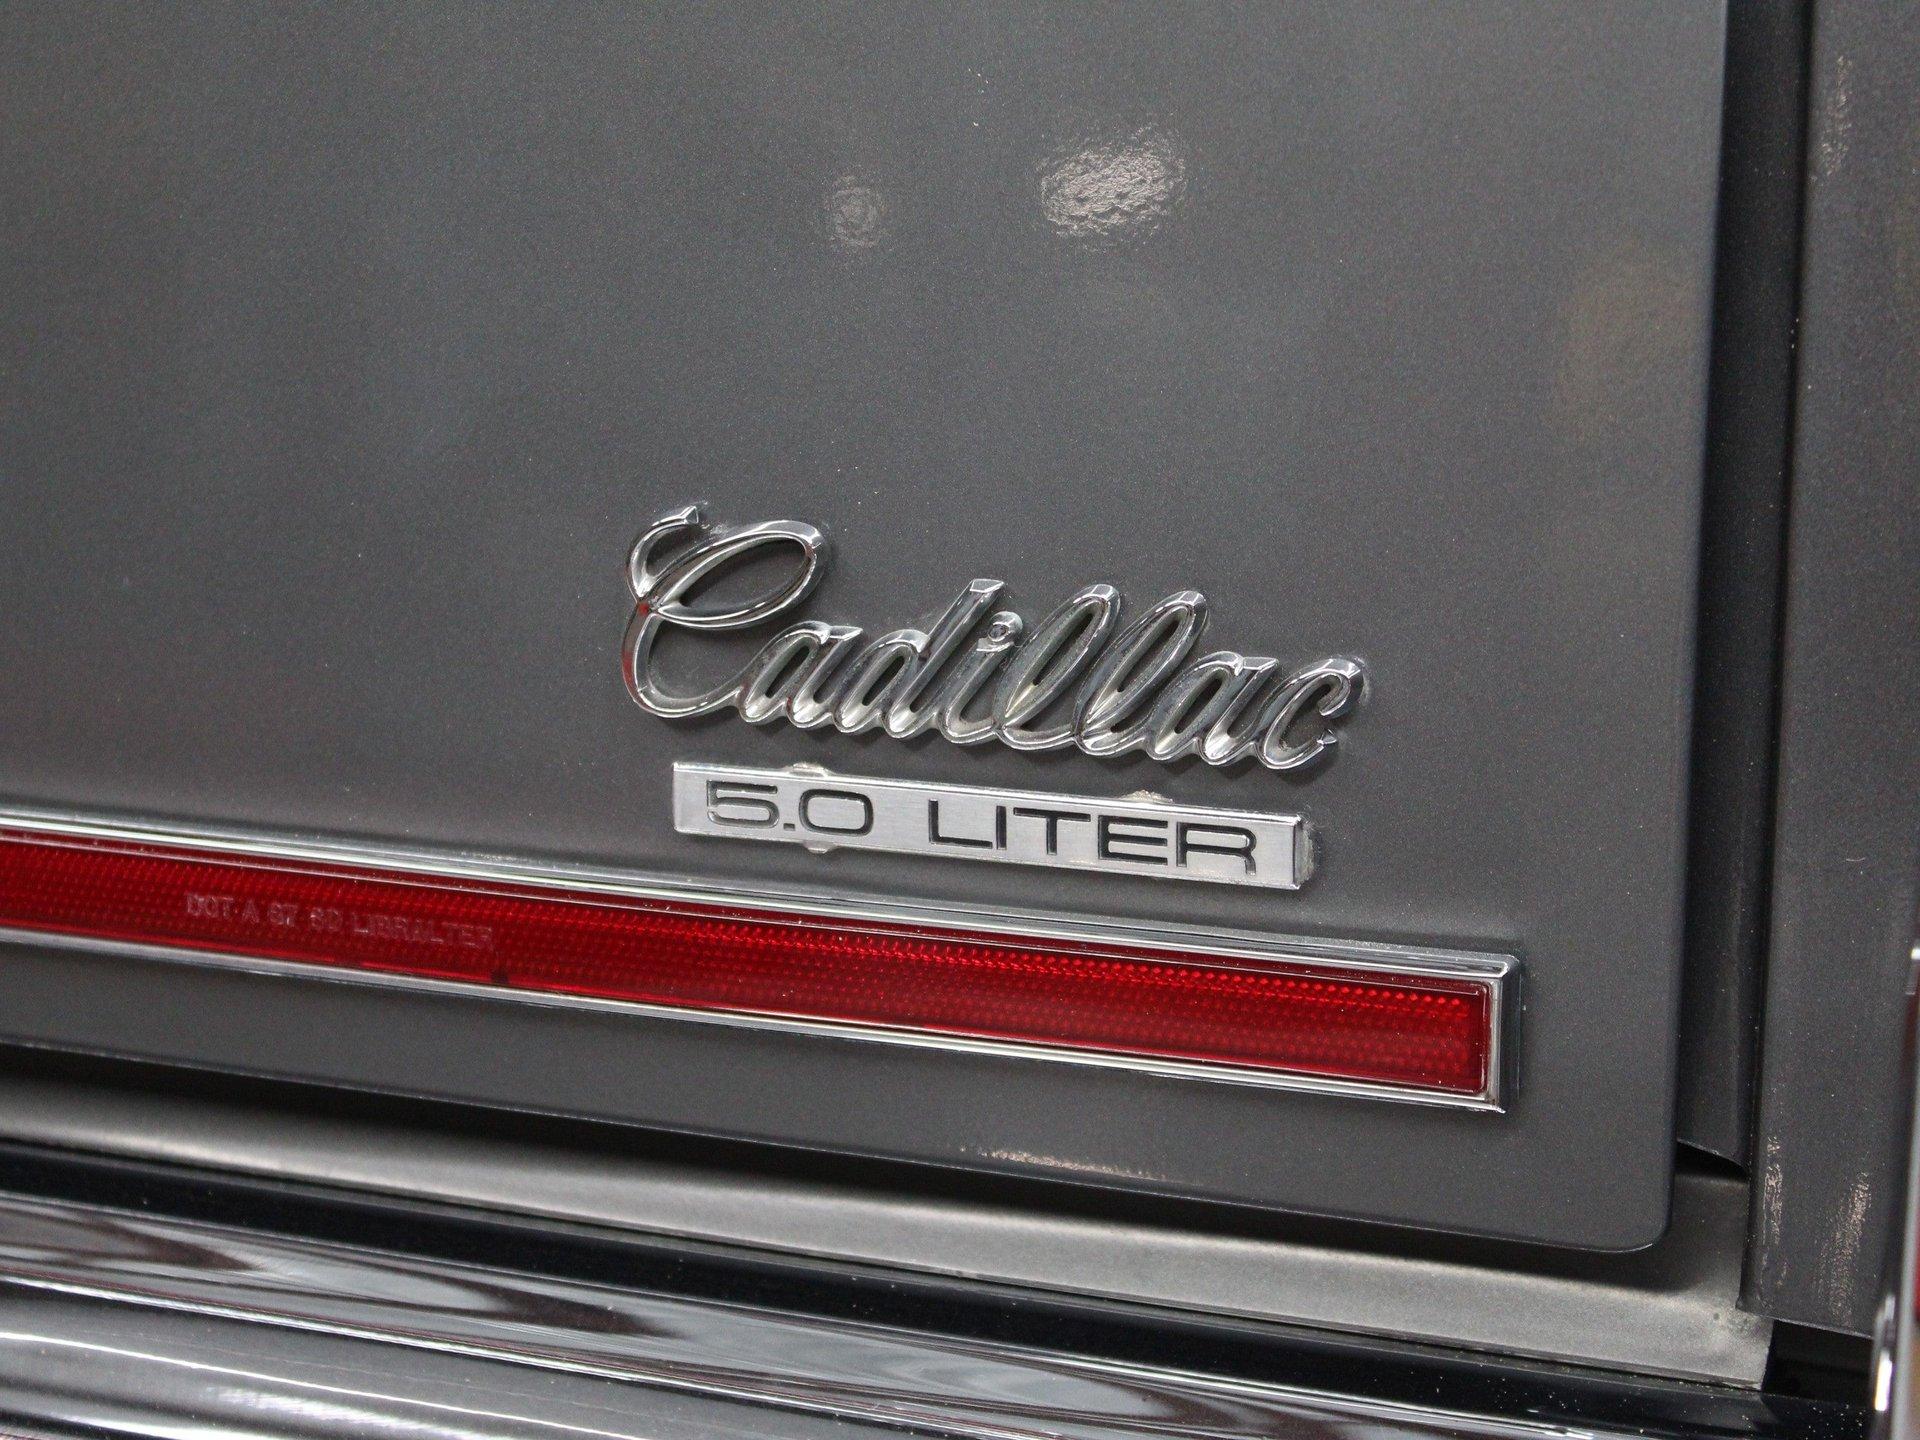 1989 Cadillac Brougham